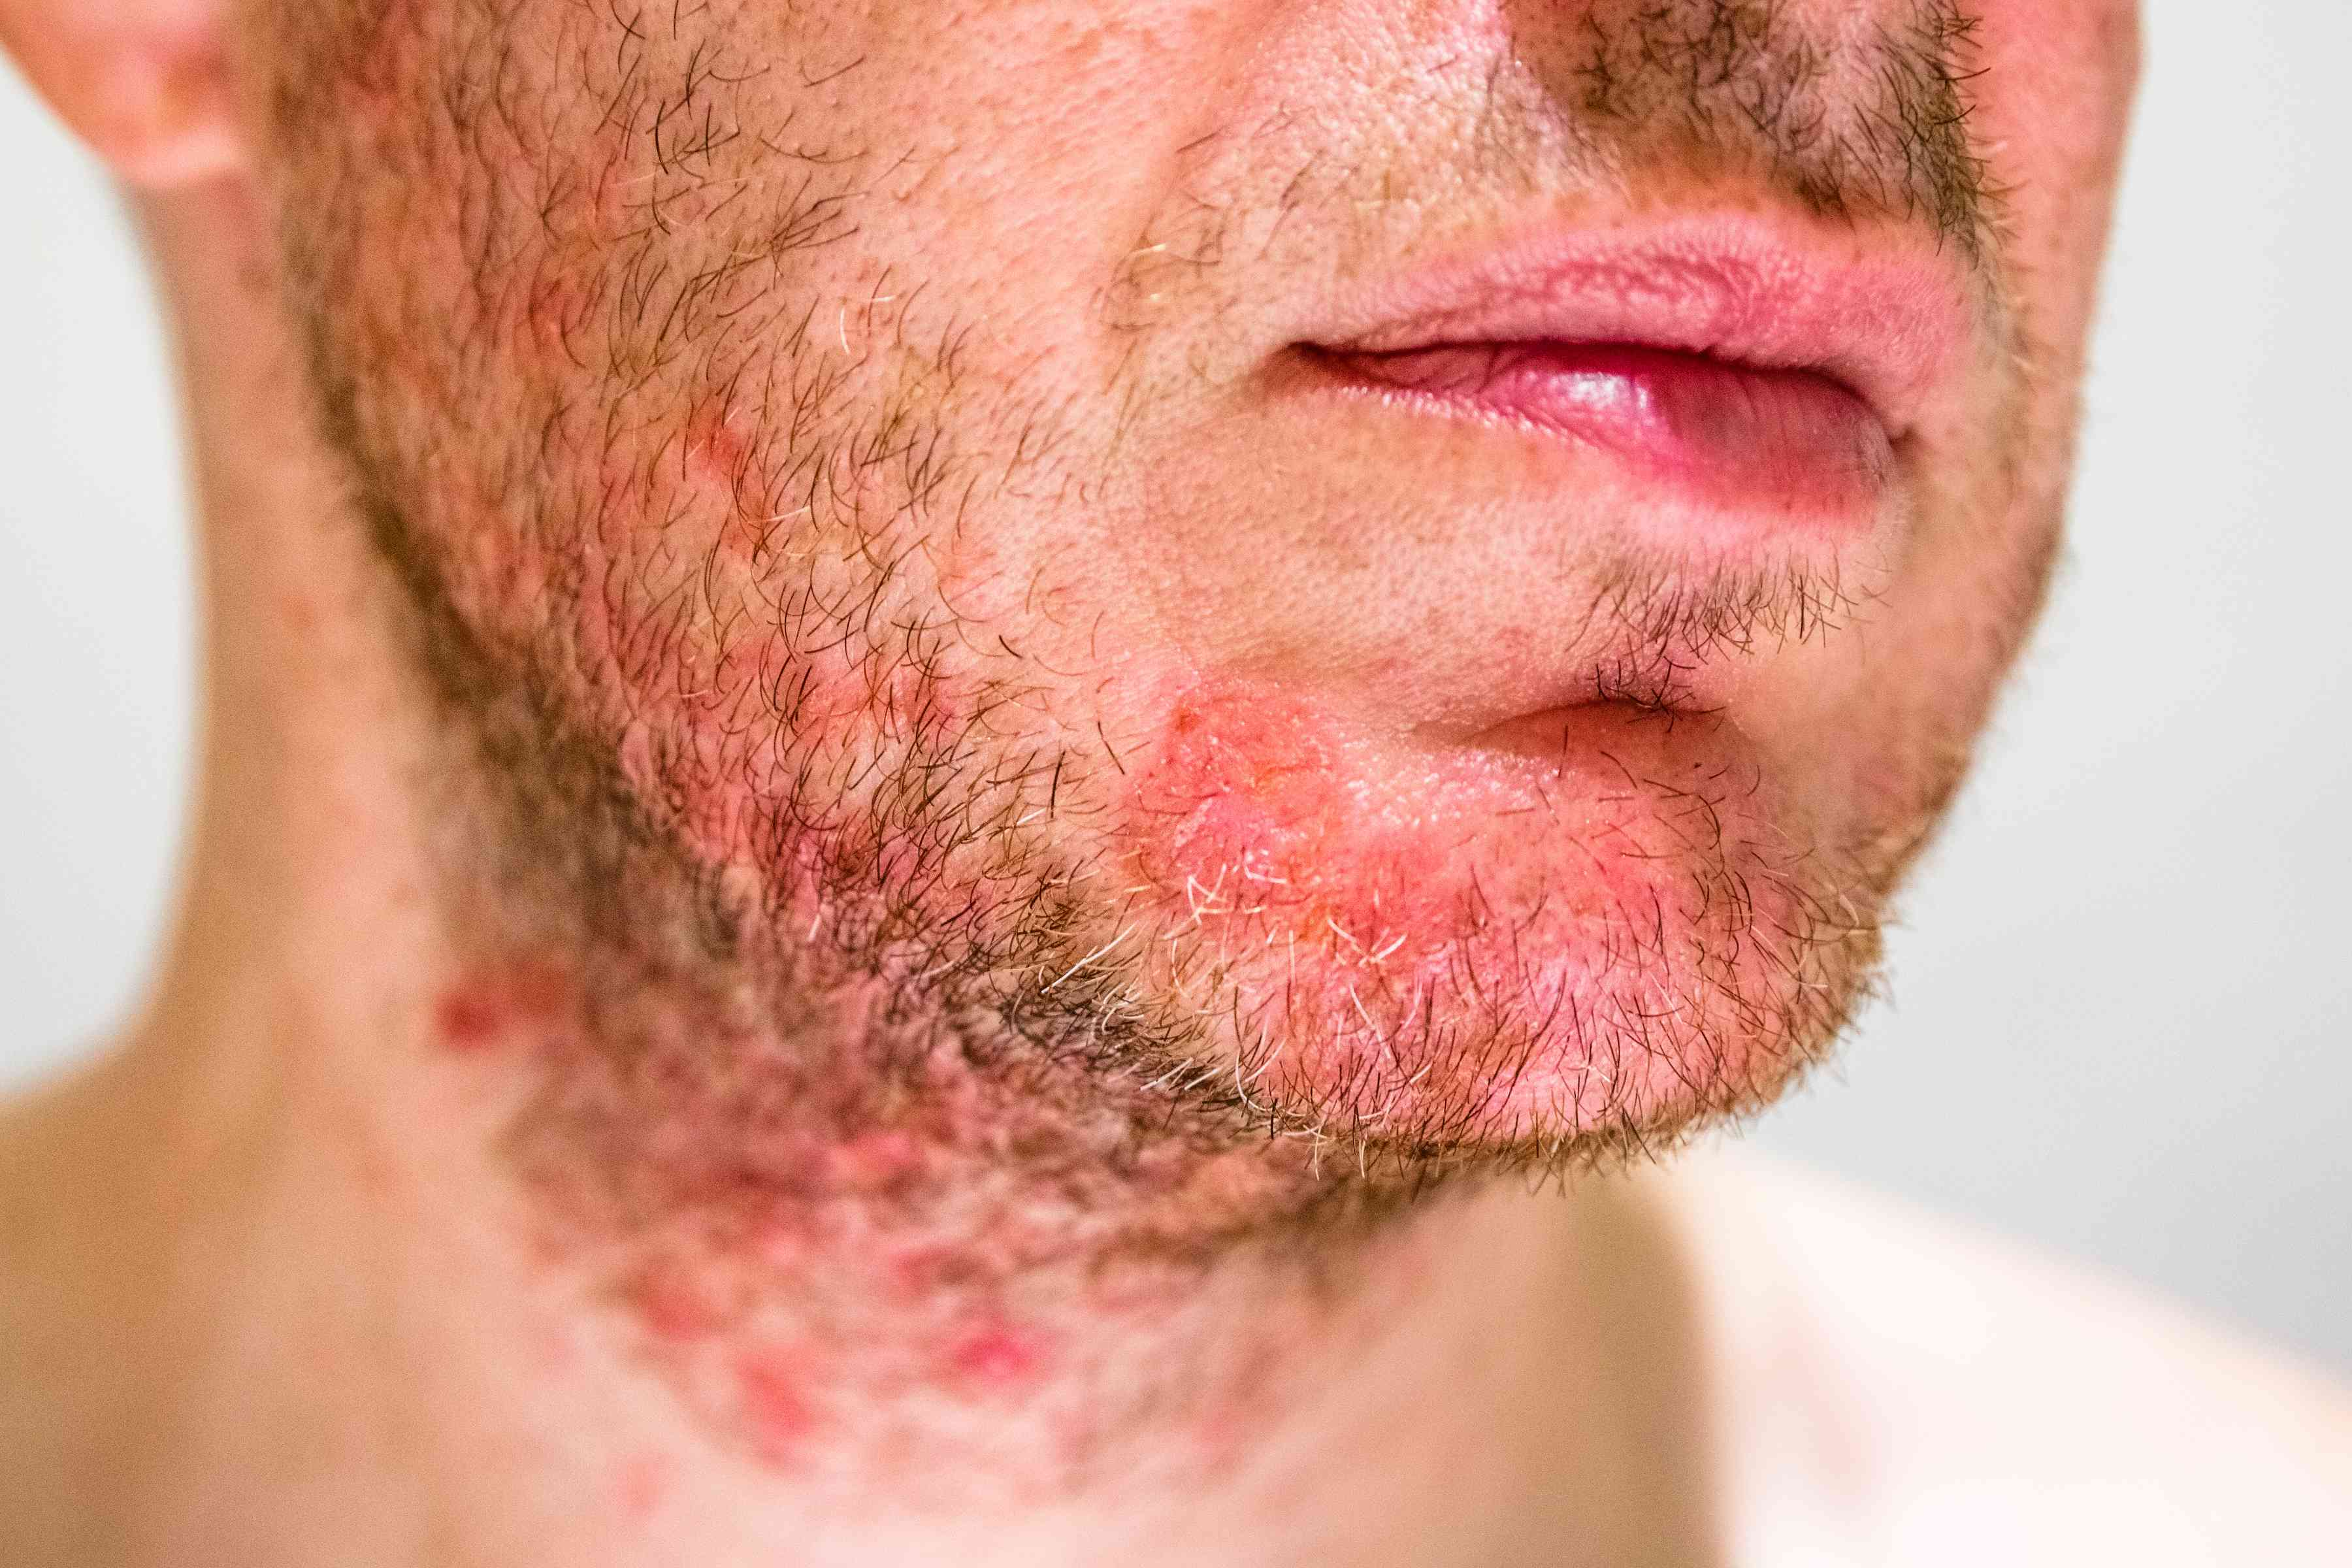 Seborrheic Dermatitis on man's beard